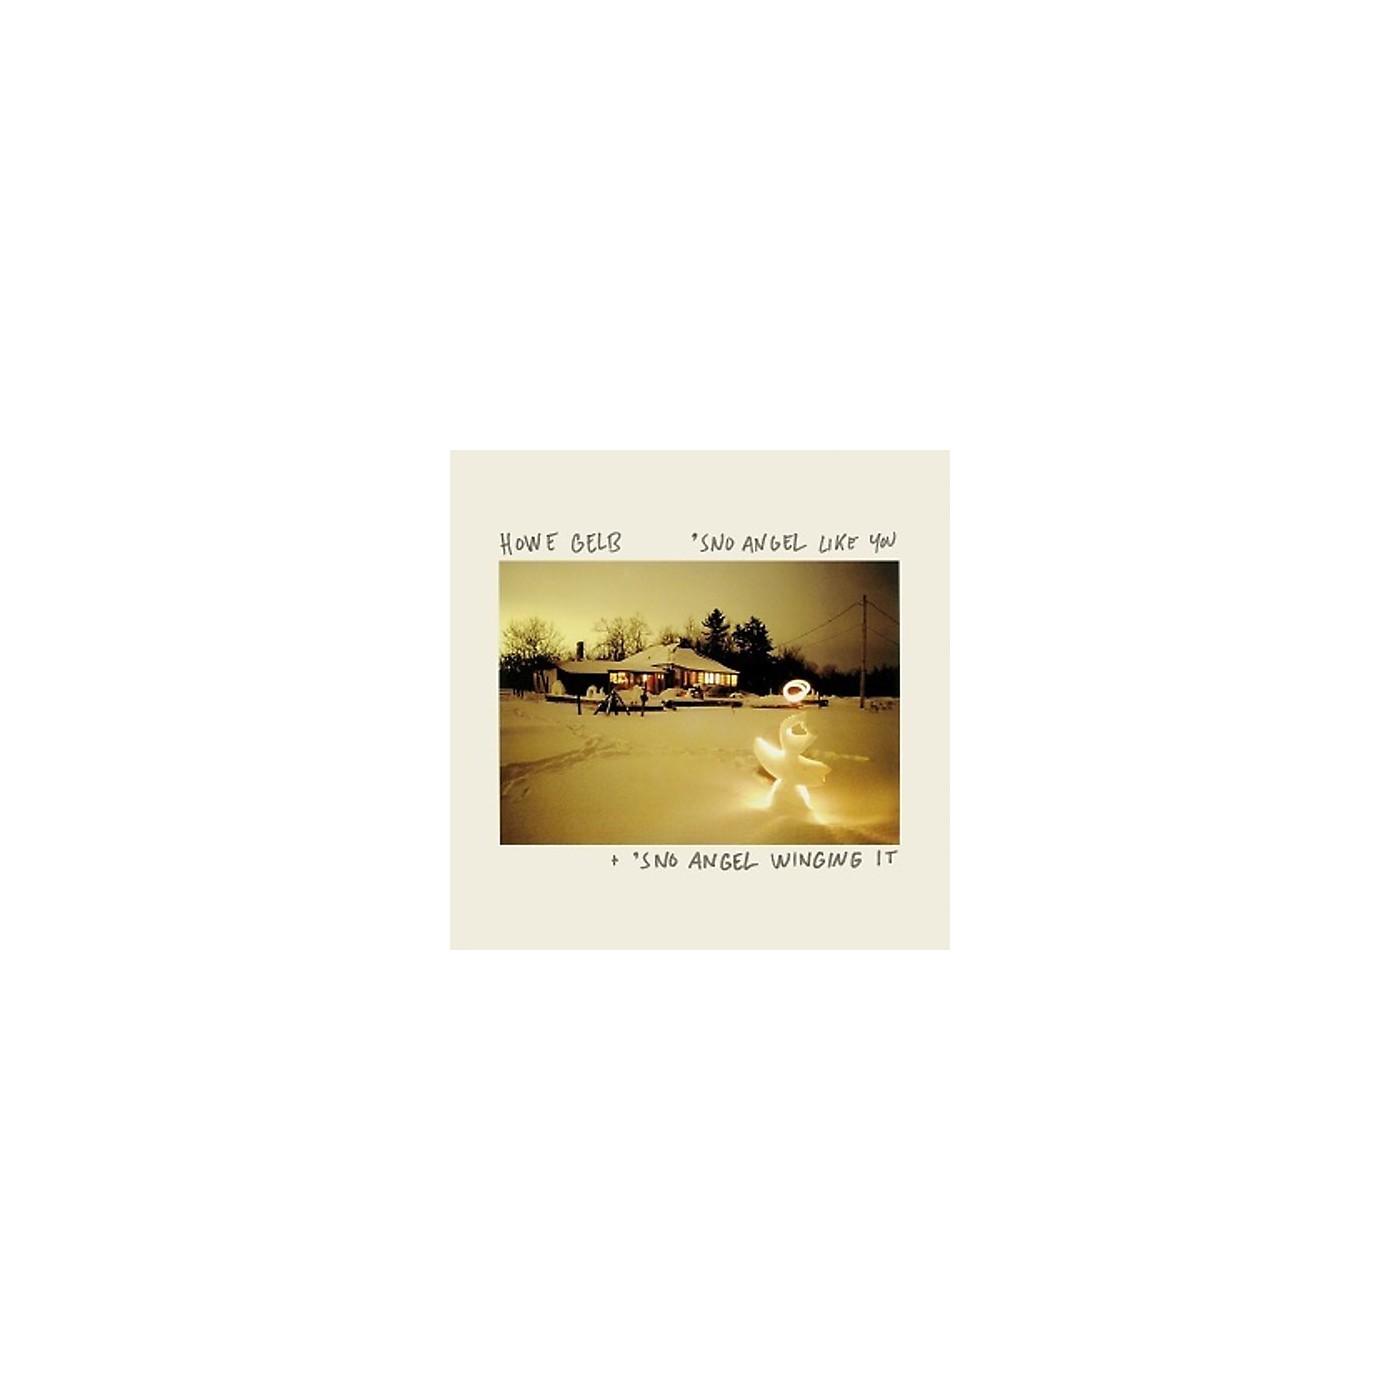 Alliance Howe Gelb - Sno Angel Like You / Sno Angel thumbnail